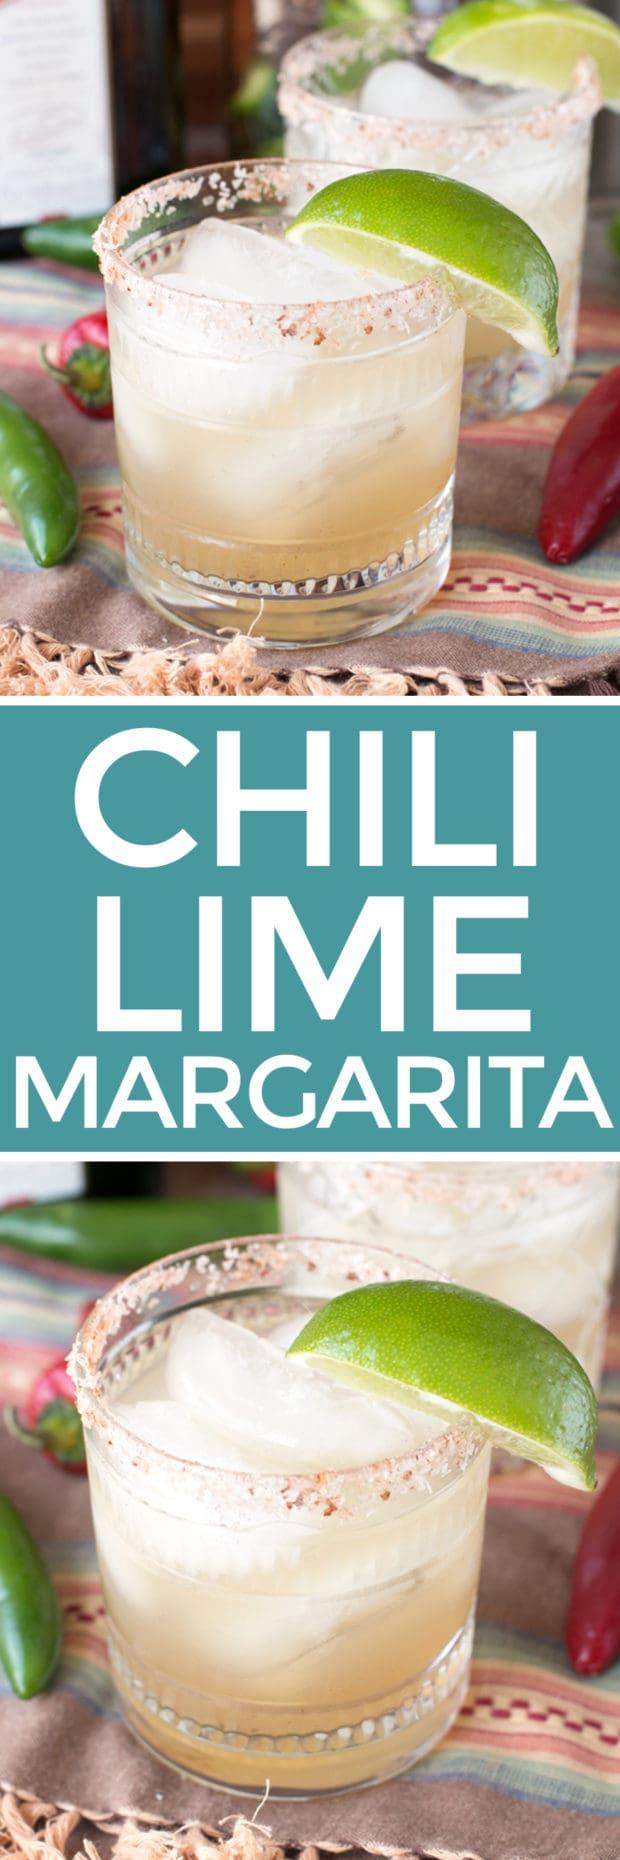 Simple Chili Lime Margarita Recipe - Cake 'n Knife